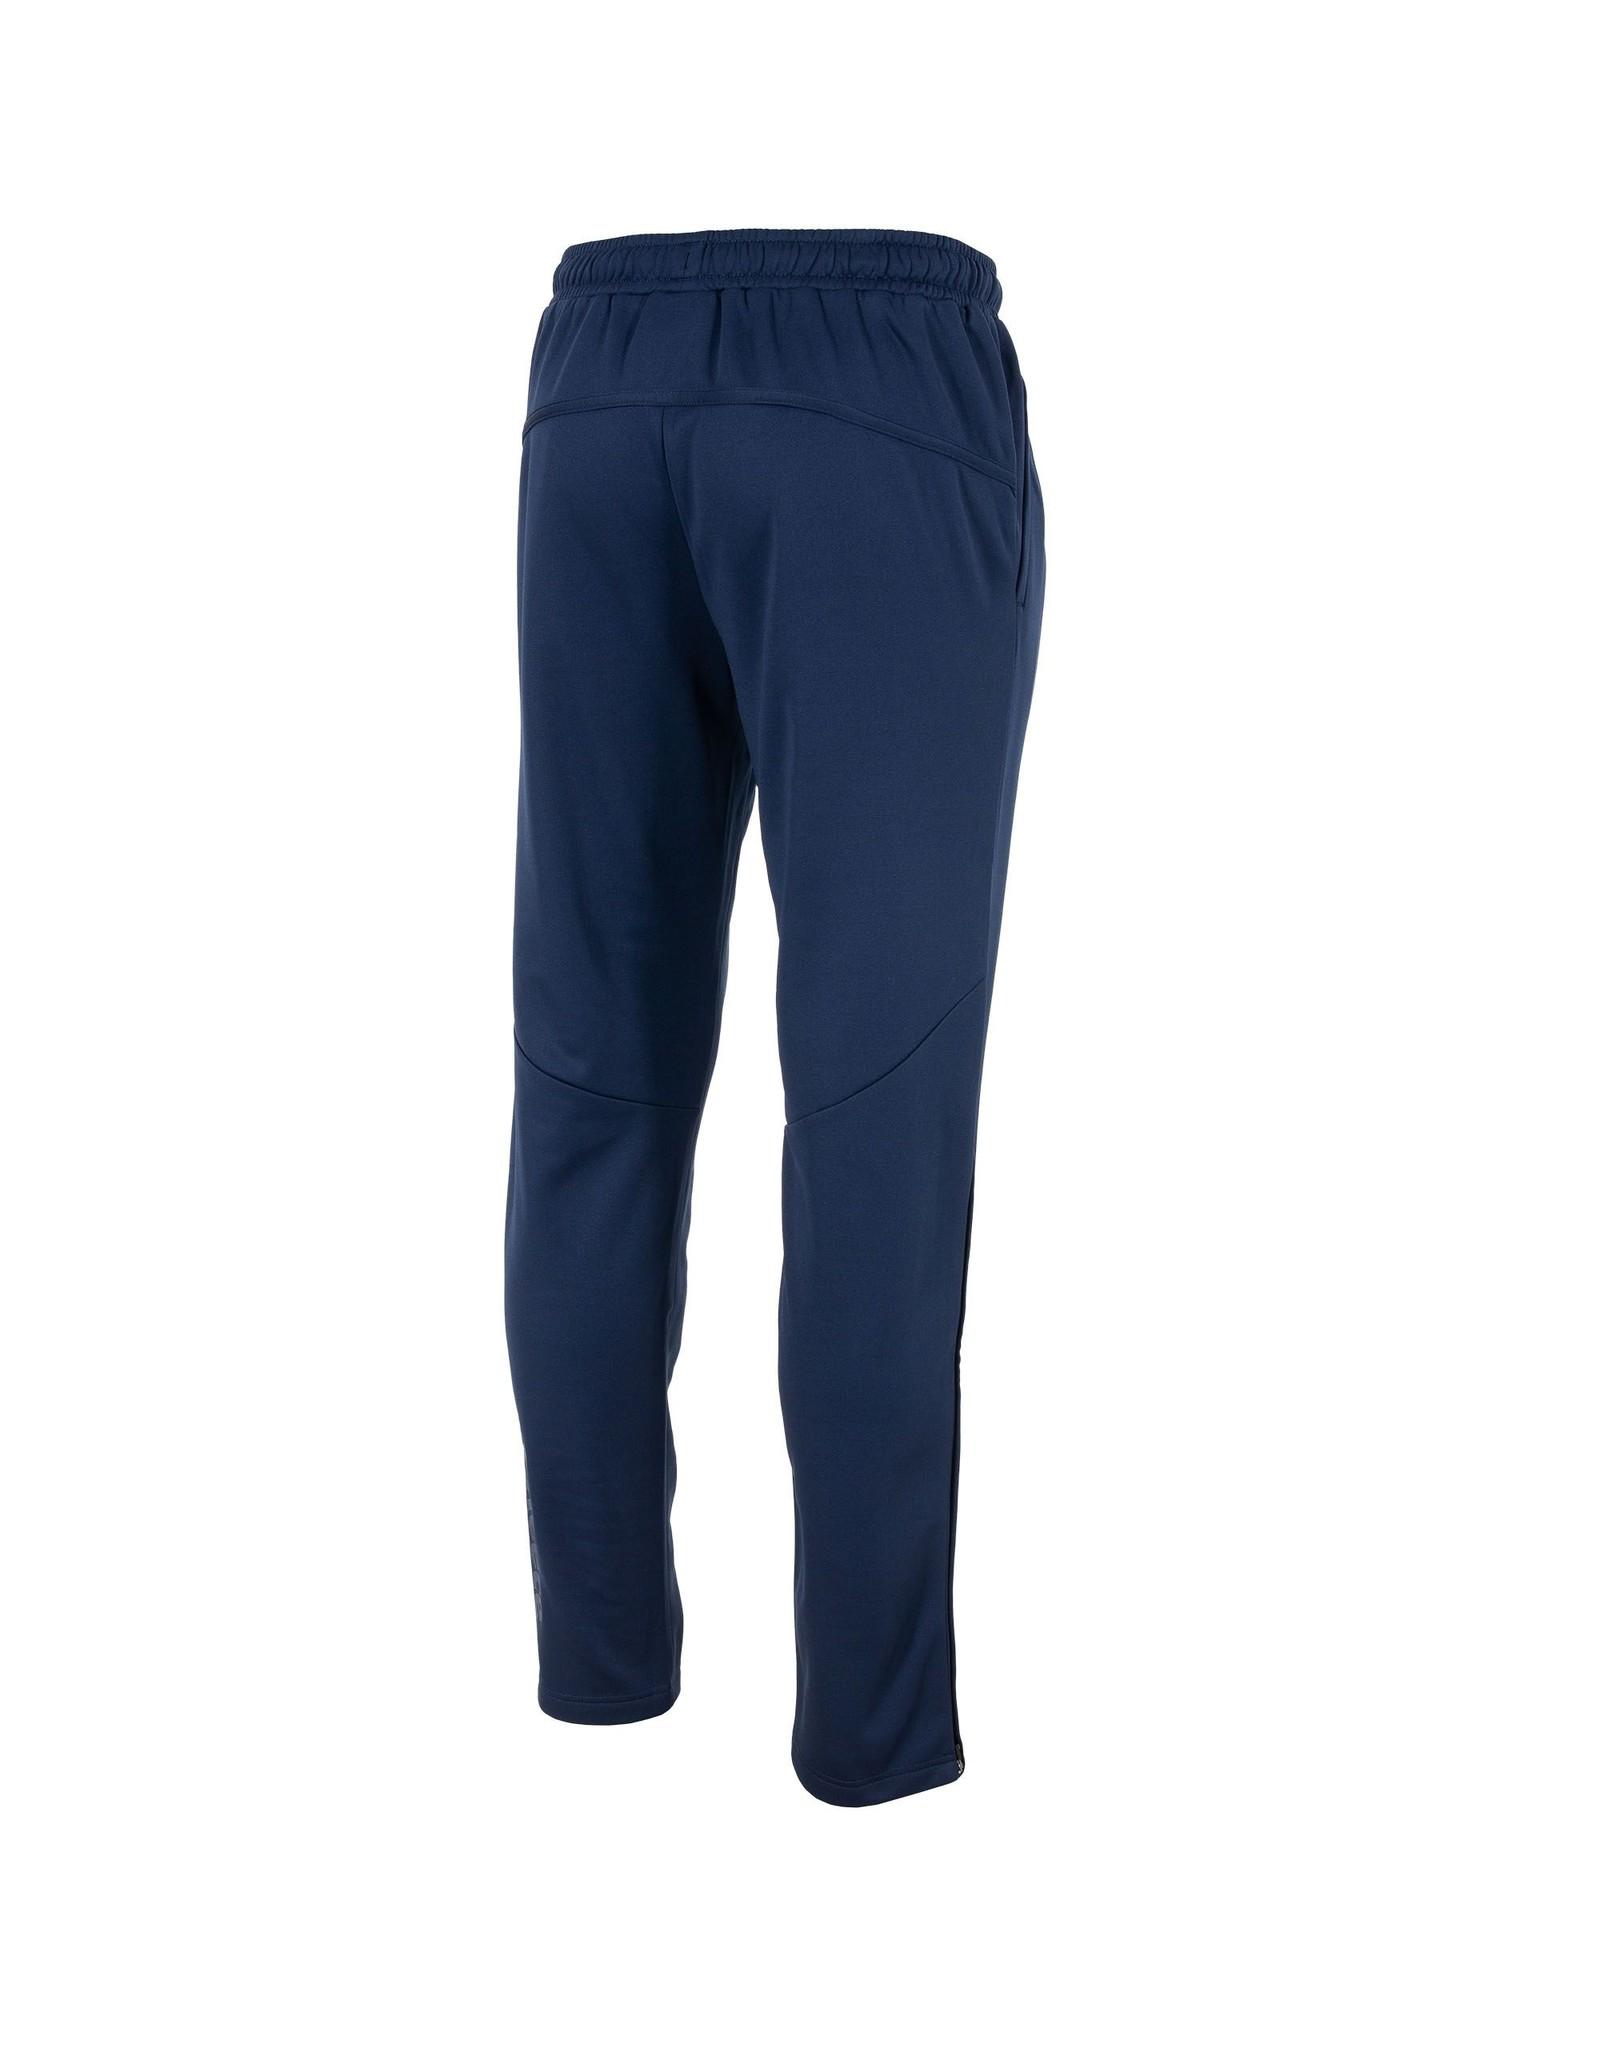 Reece Australia Icon TTS Pants-Navy